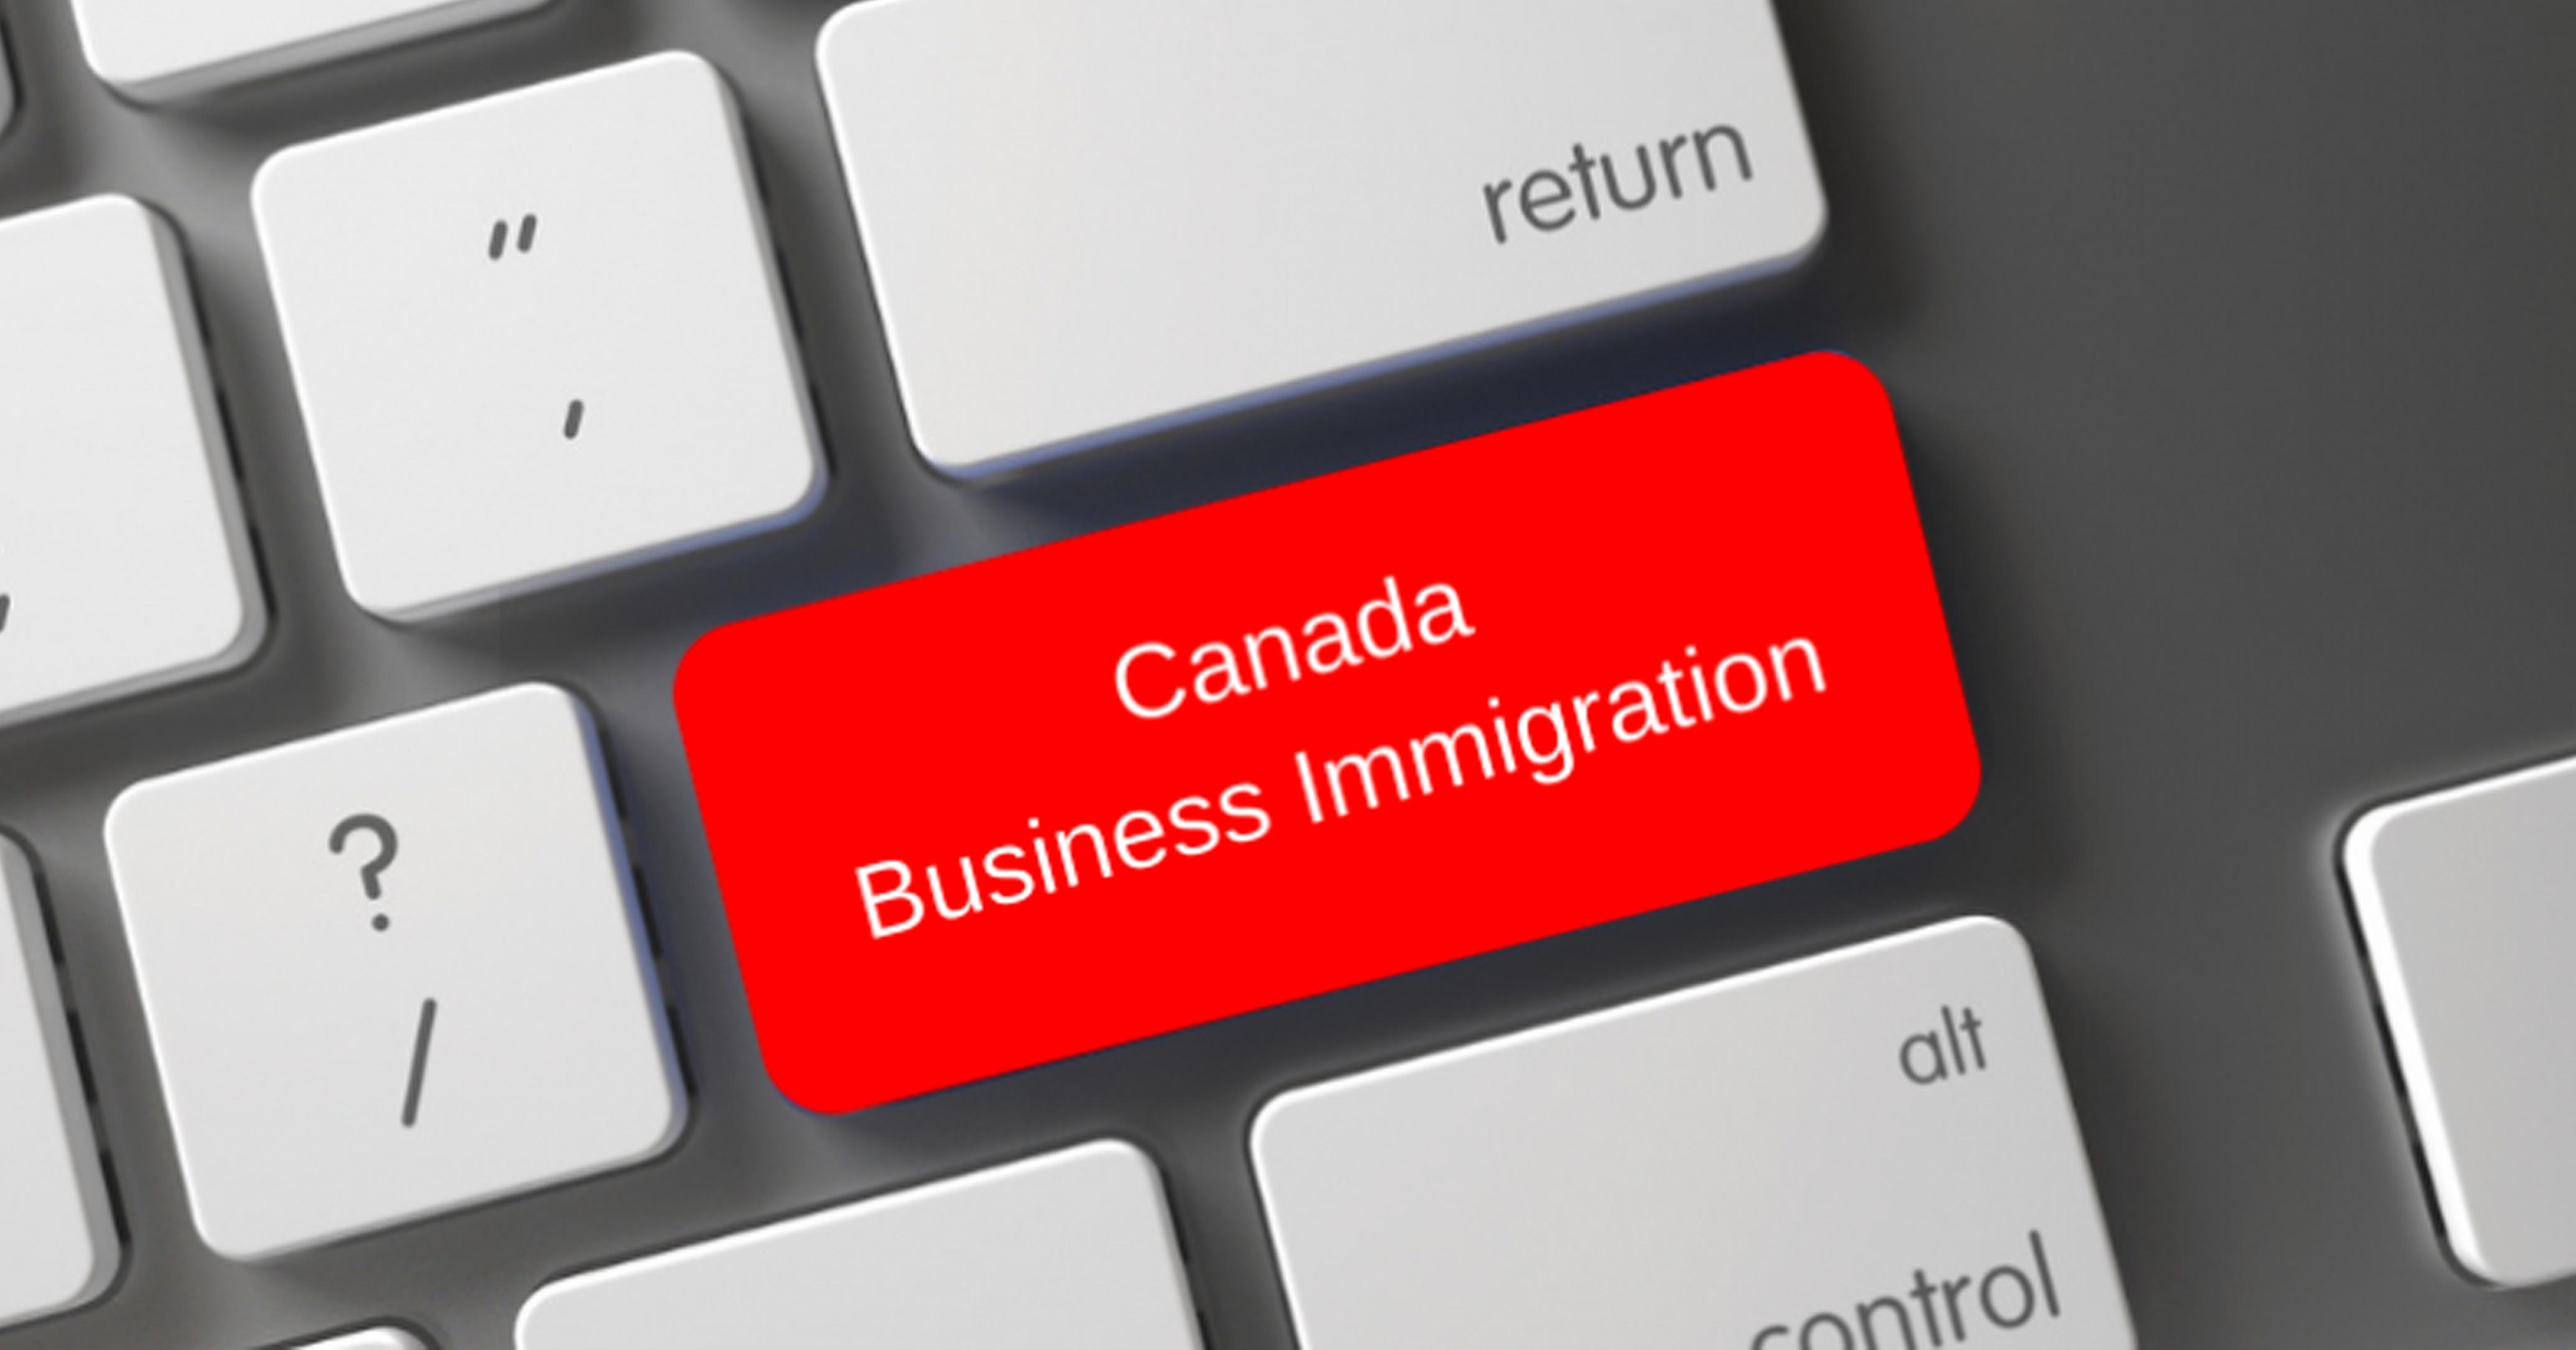 Hu总 您的投资移民项目工签支持信来啦!